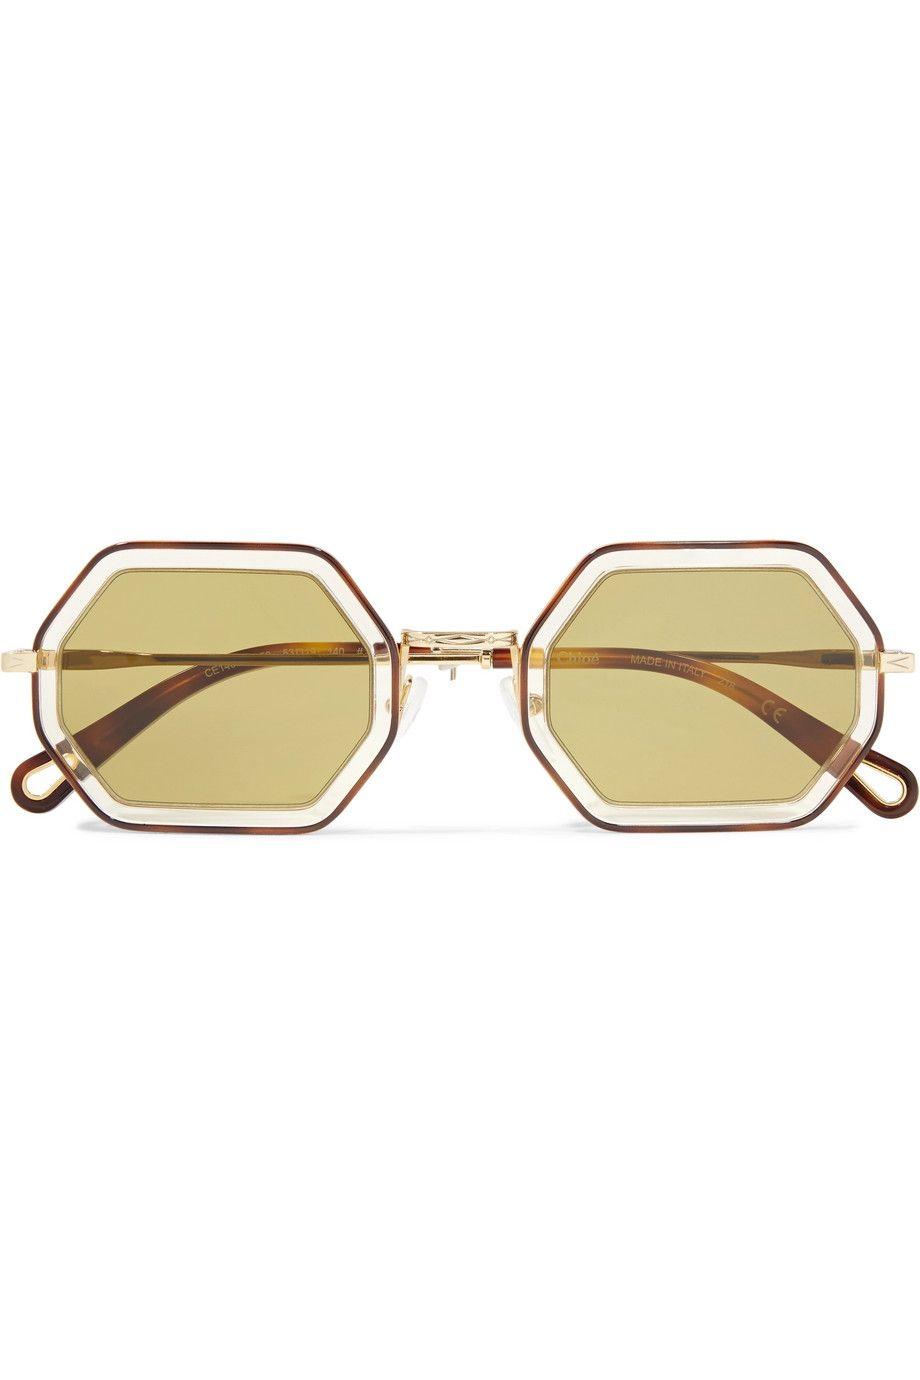 Dior Sunglasses and Eyeglasses Collection | Designer Eyes